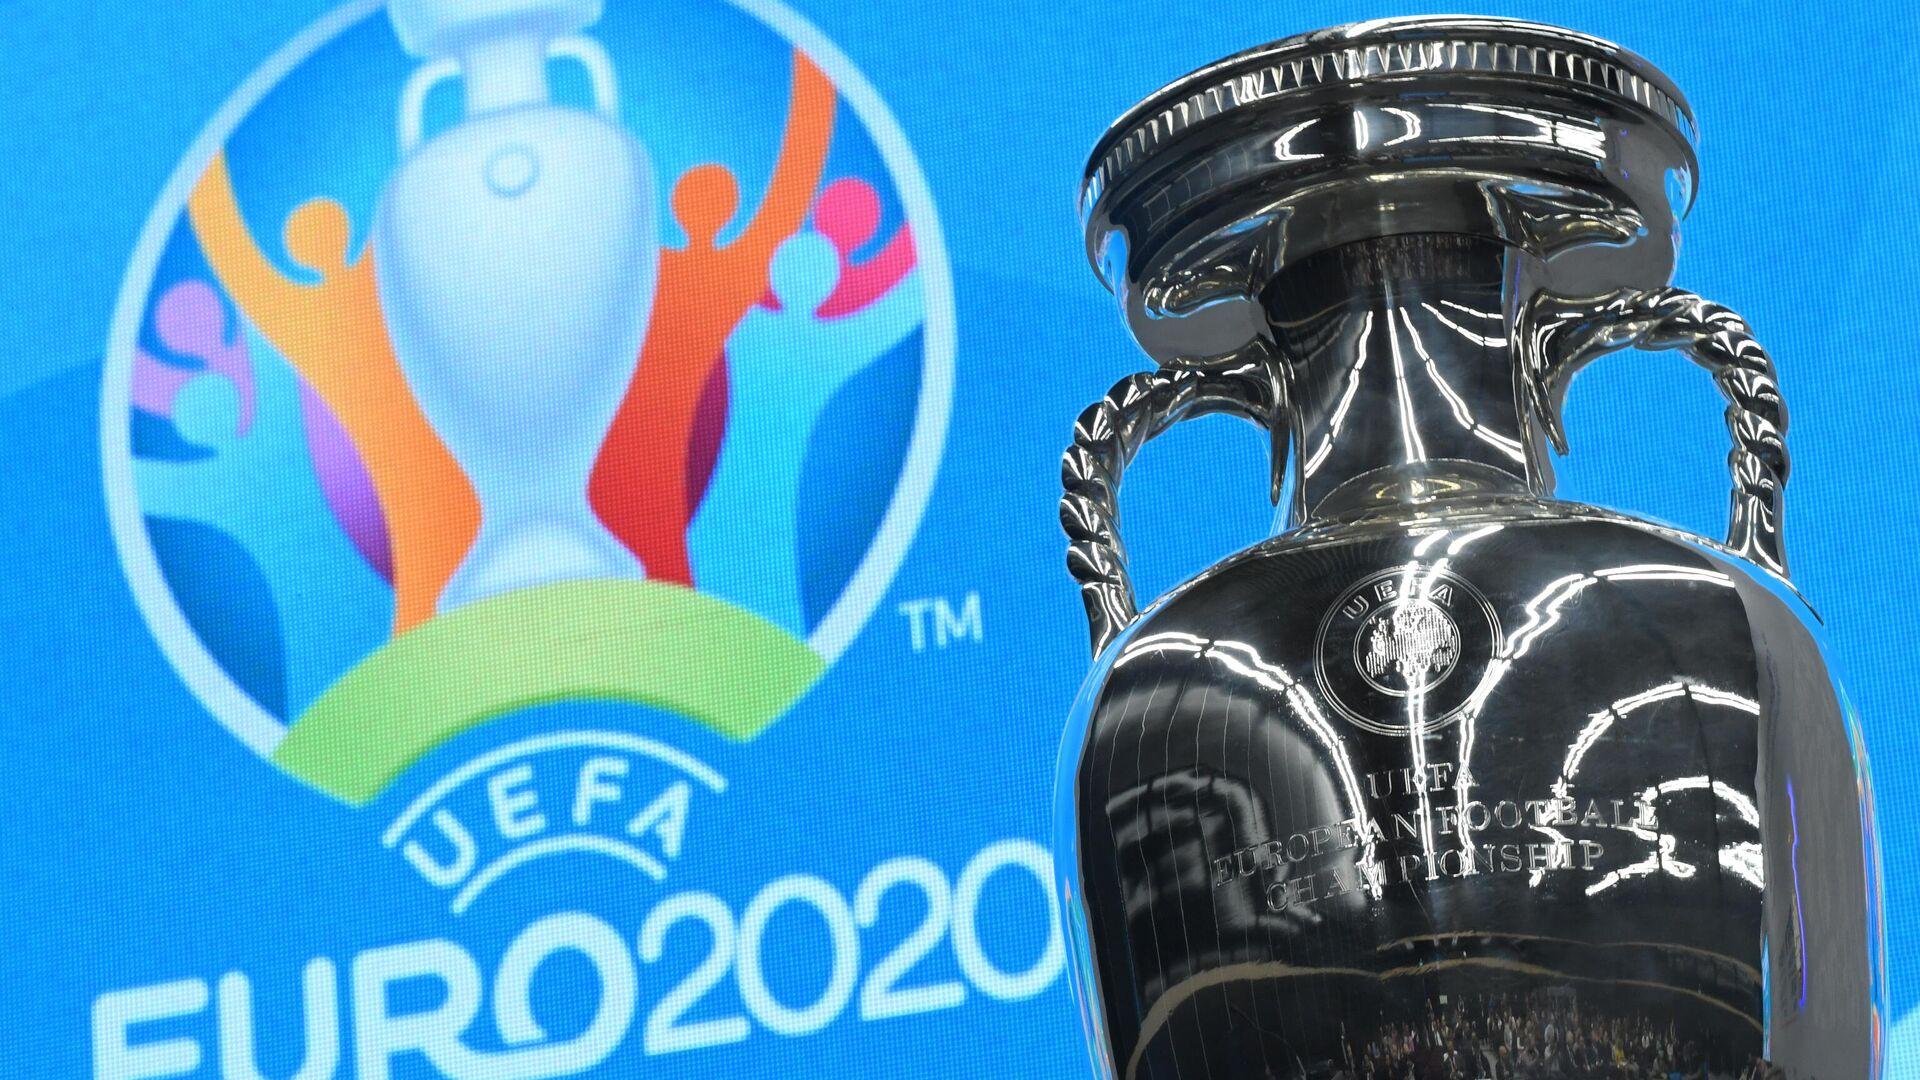 Кубок и логотип чемпионата Европы-2020 по футболу - РИА Новости, 1920, 25.02.2021